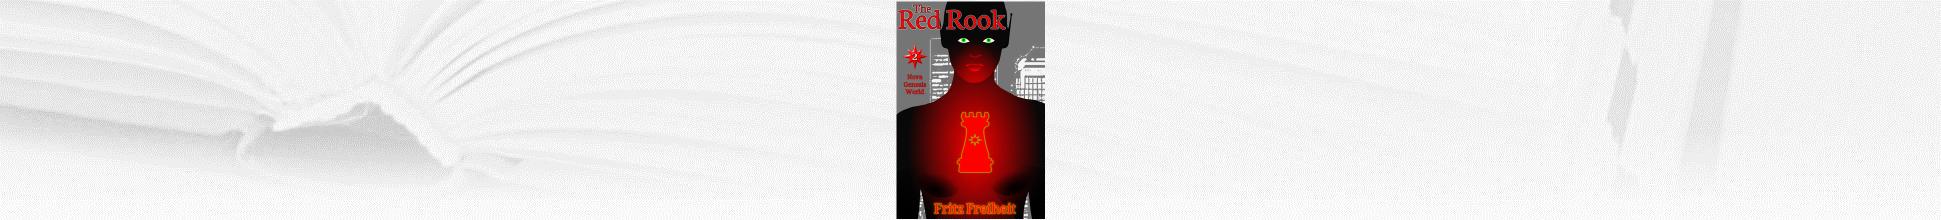 fritz freiheit.com blog